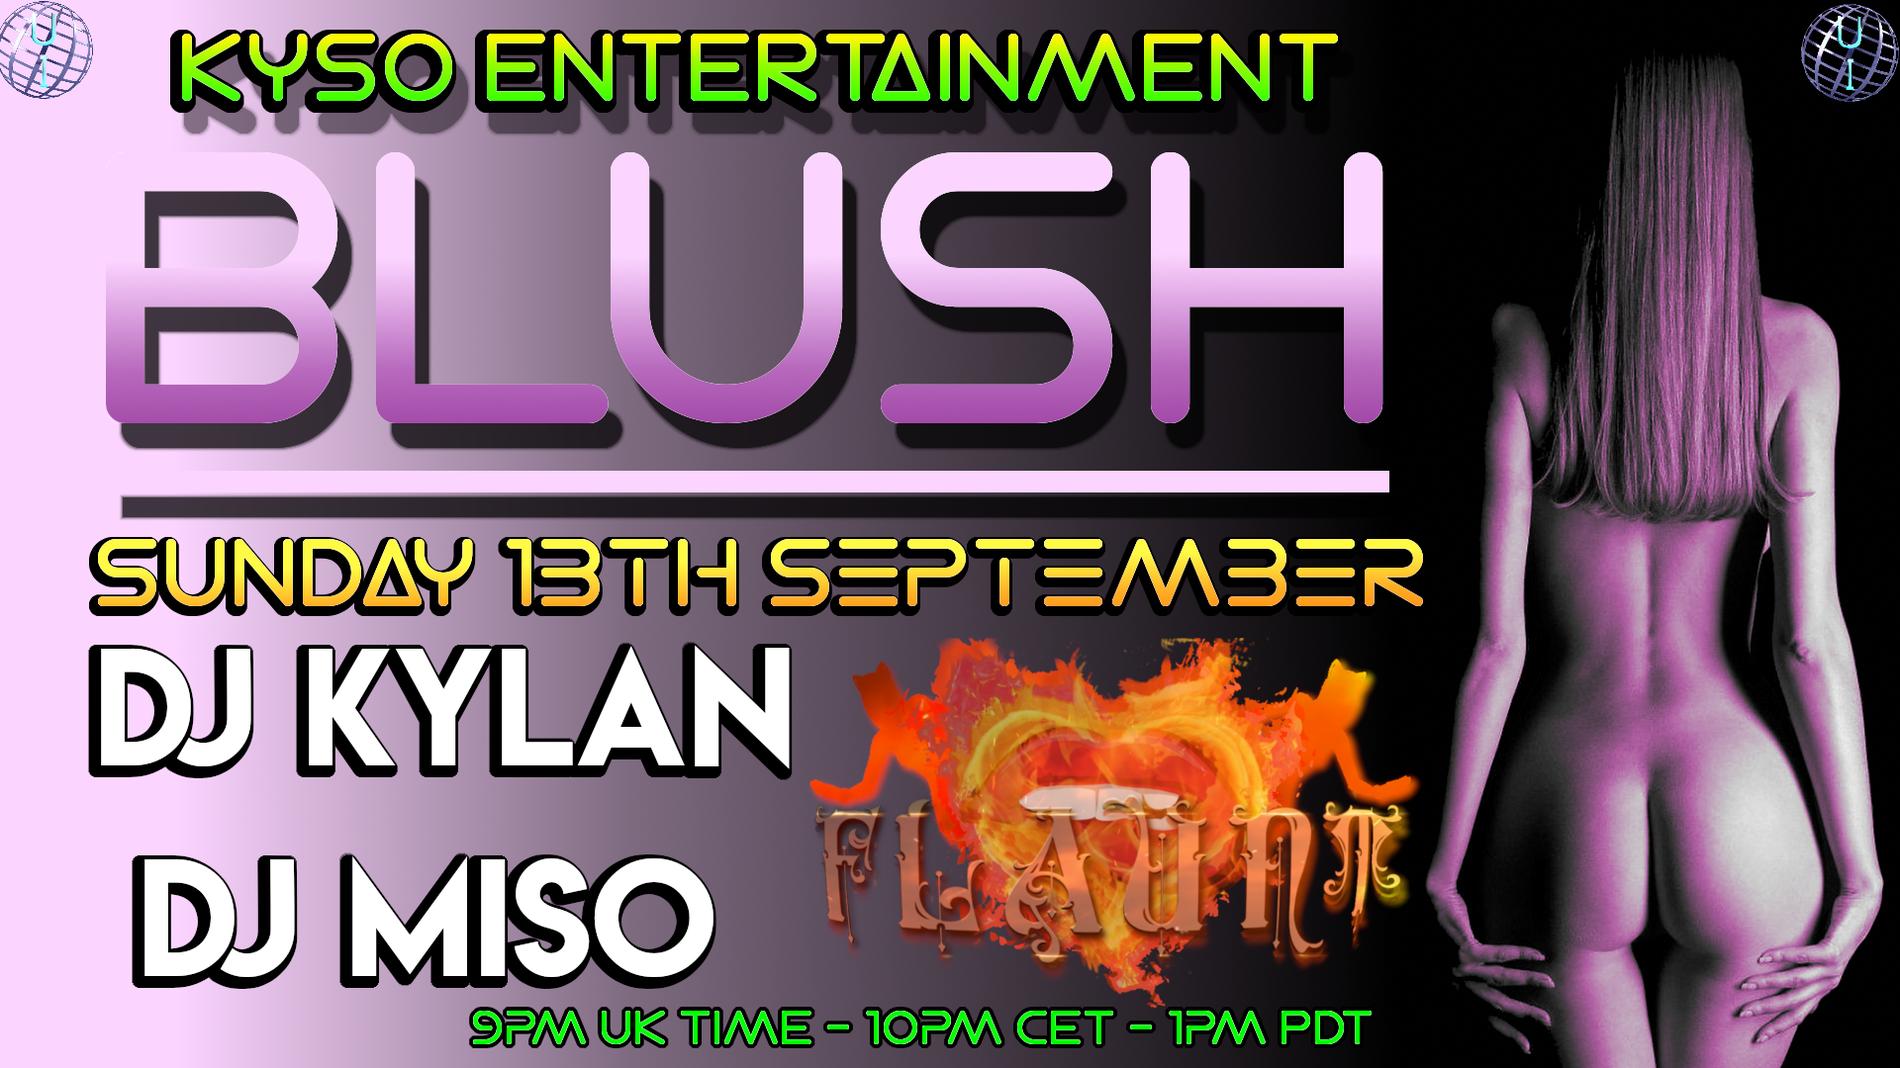 Blush_Sept_13th 1.png